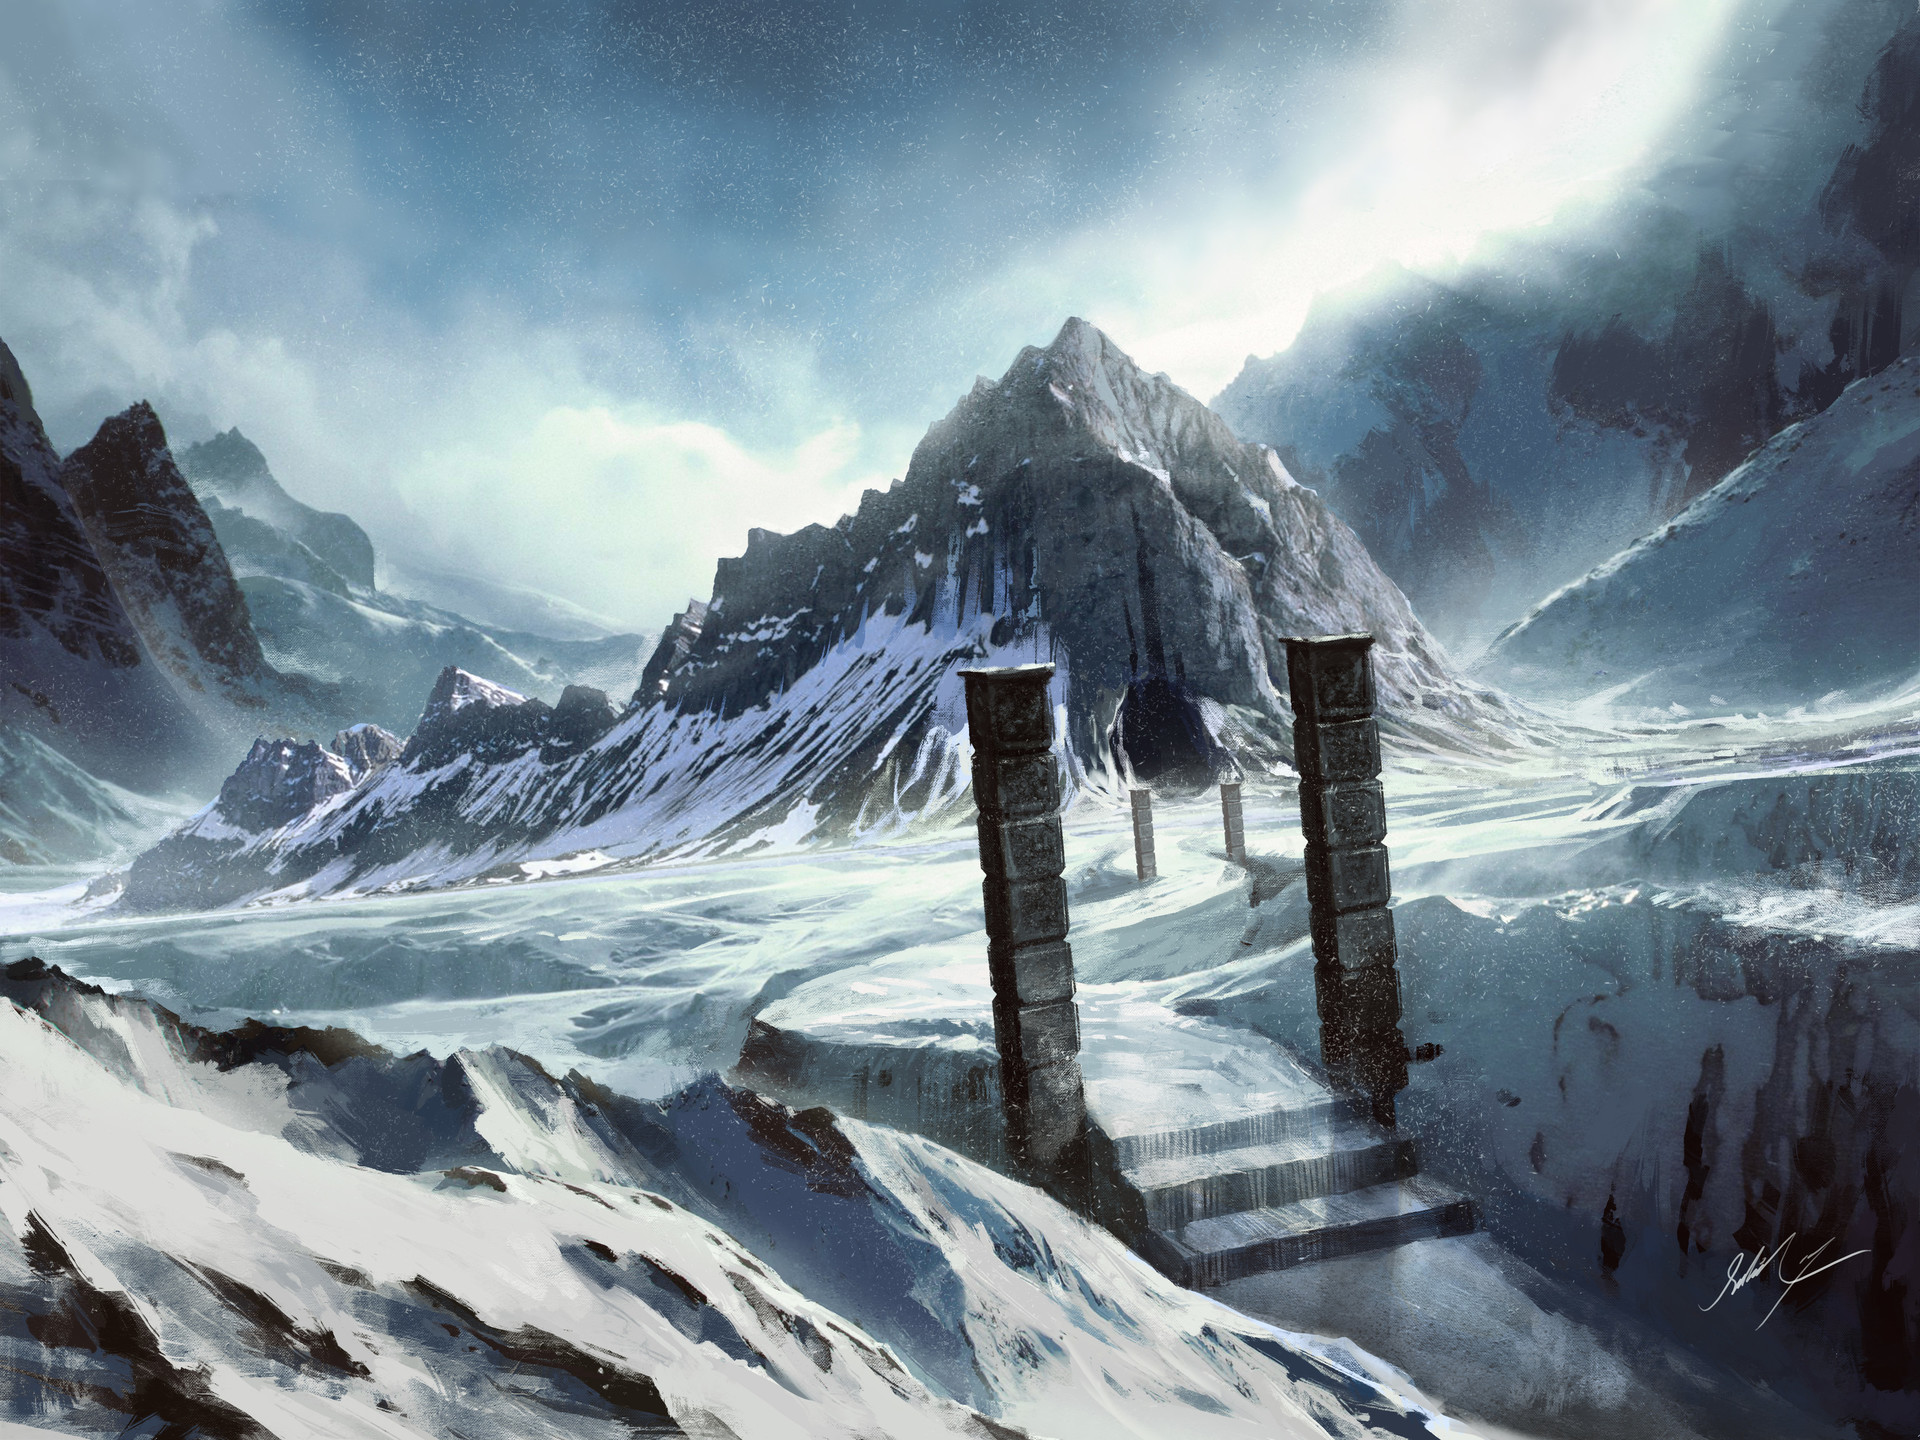 Sahil trivedi snow mountains 2